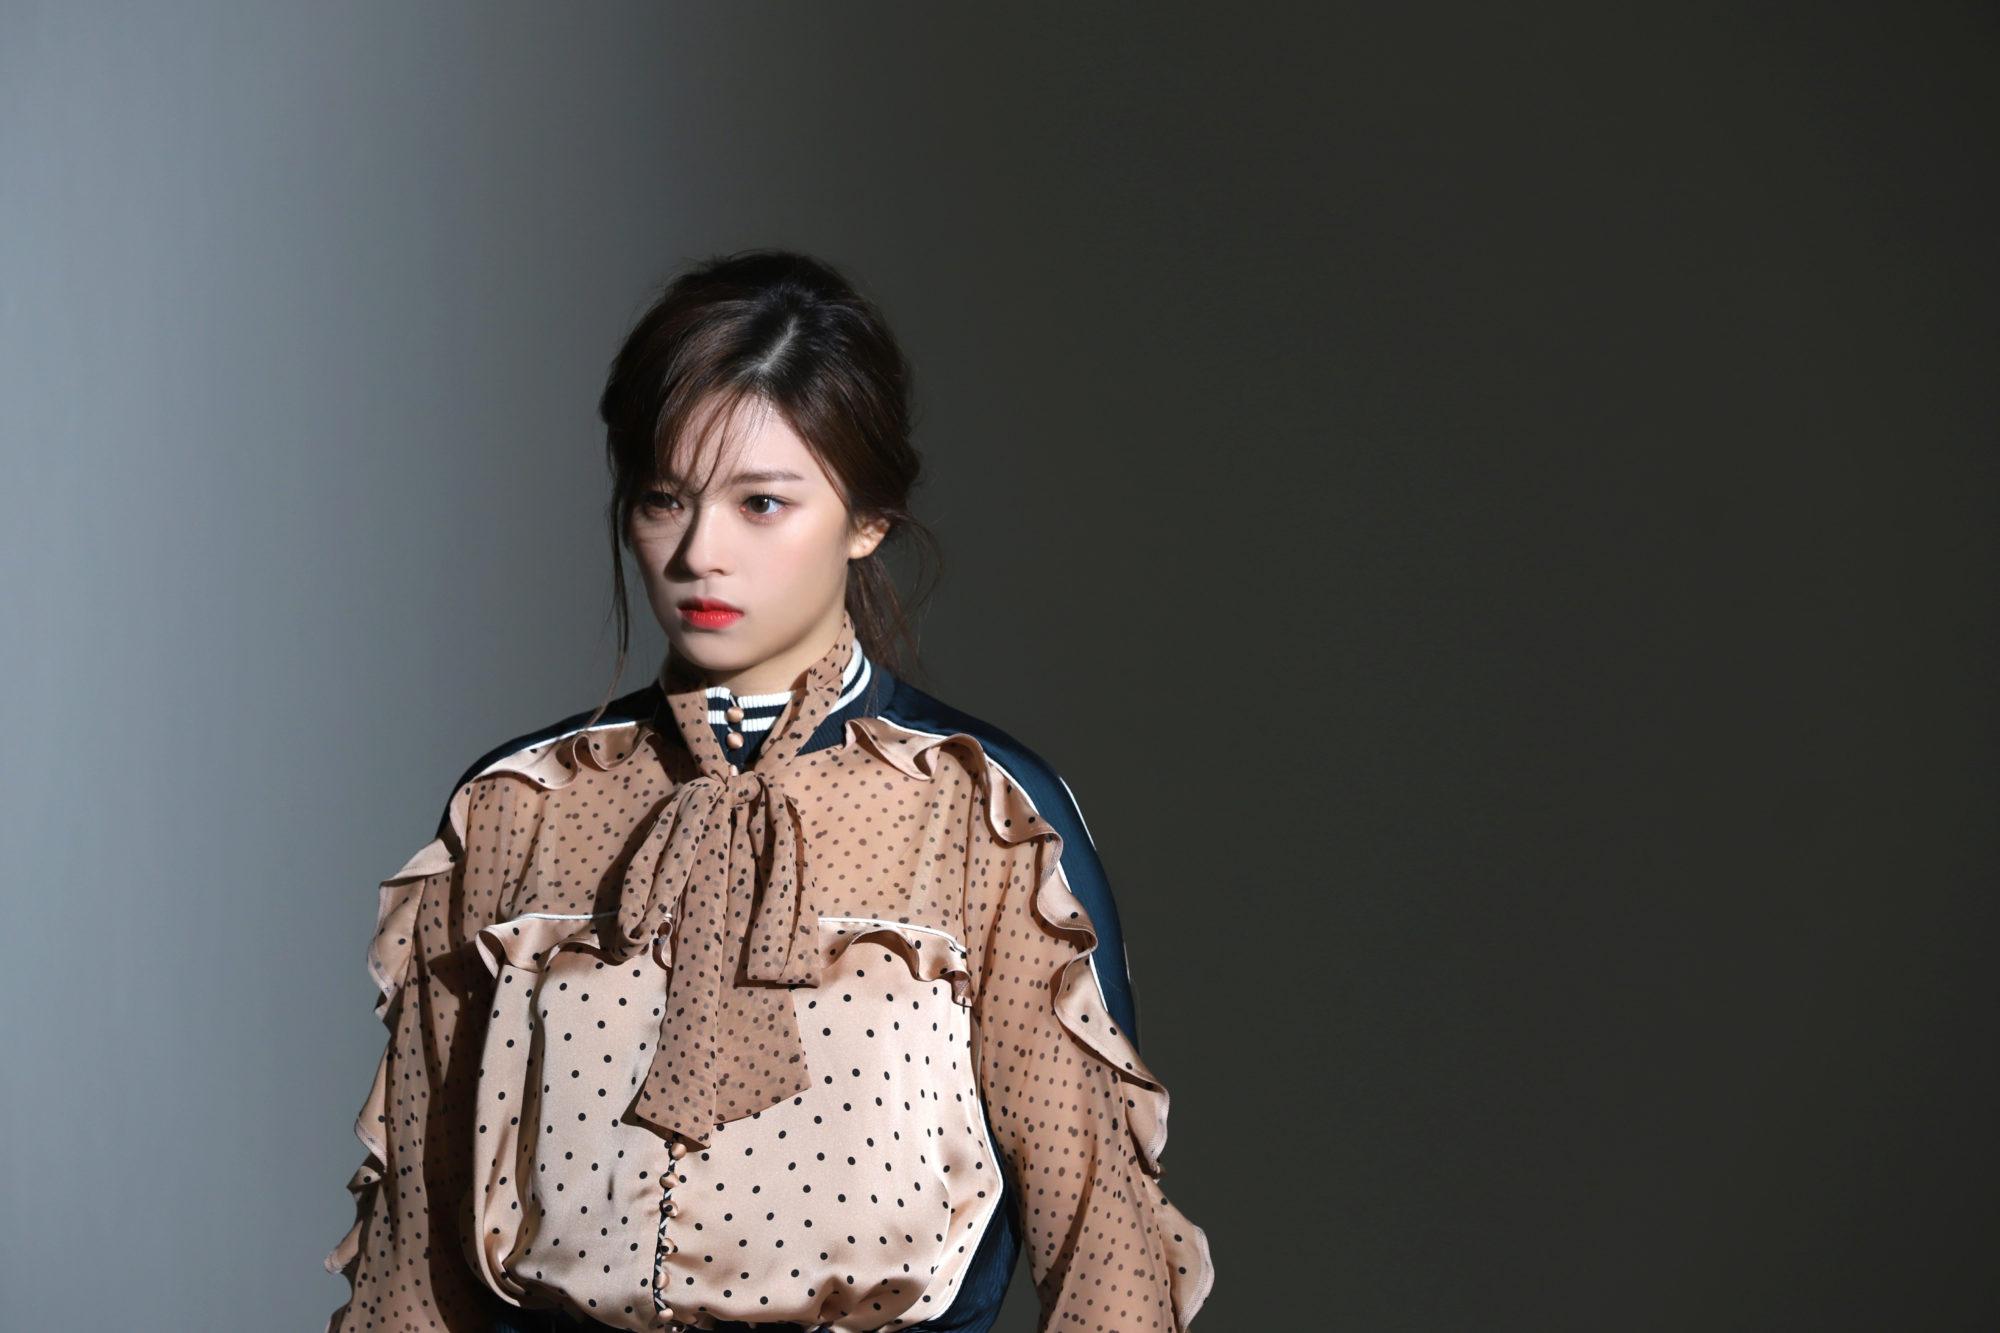 Twice Allure Jeongyeon 2019 HD